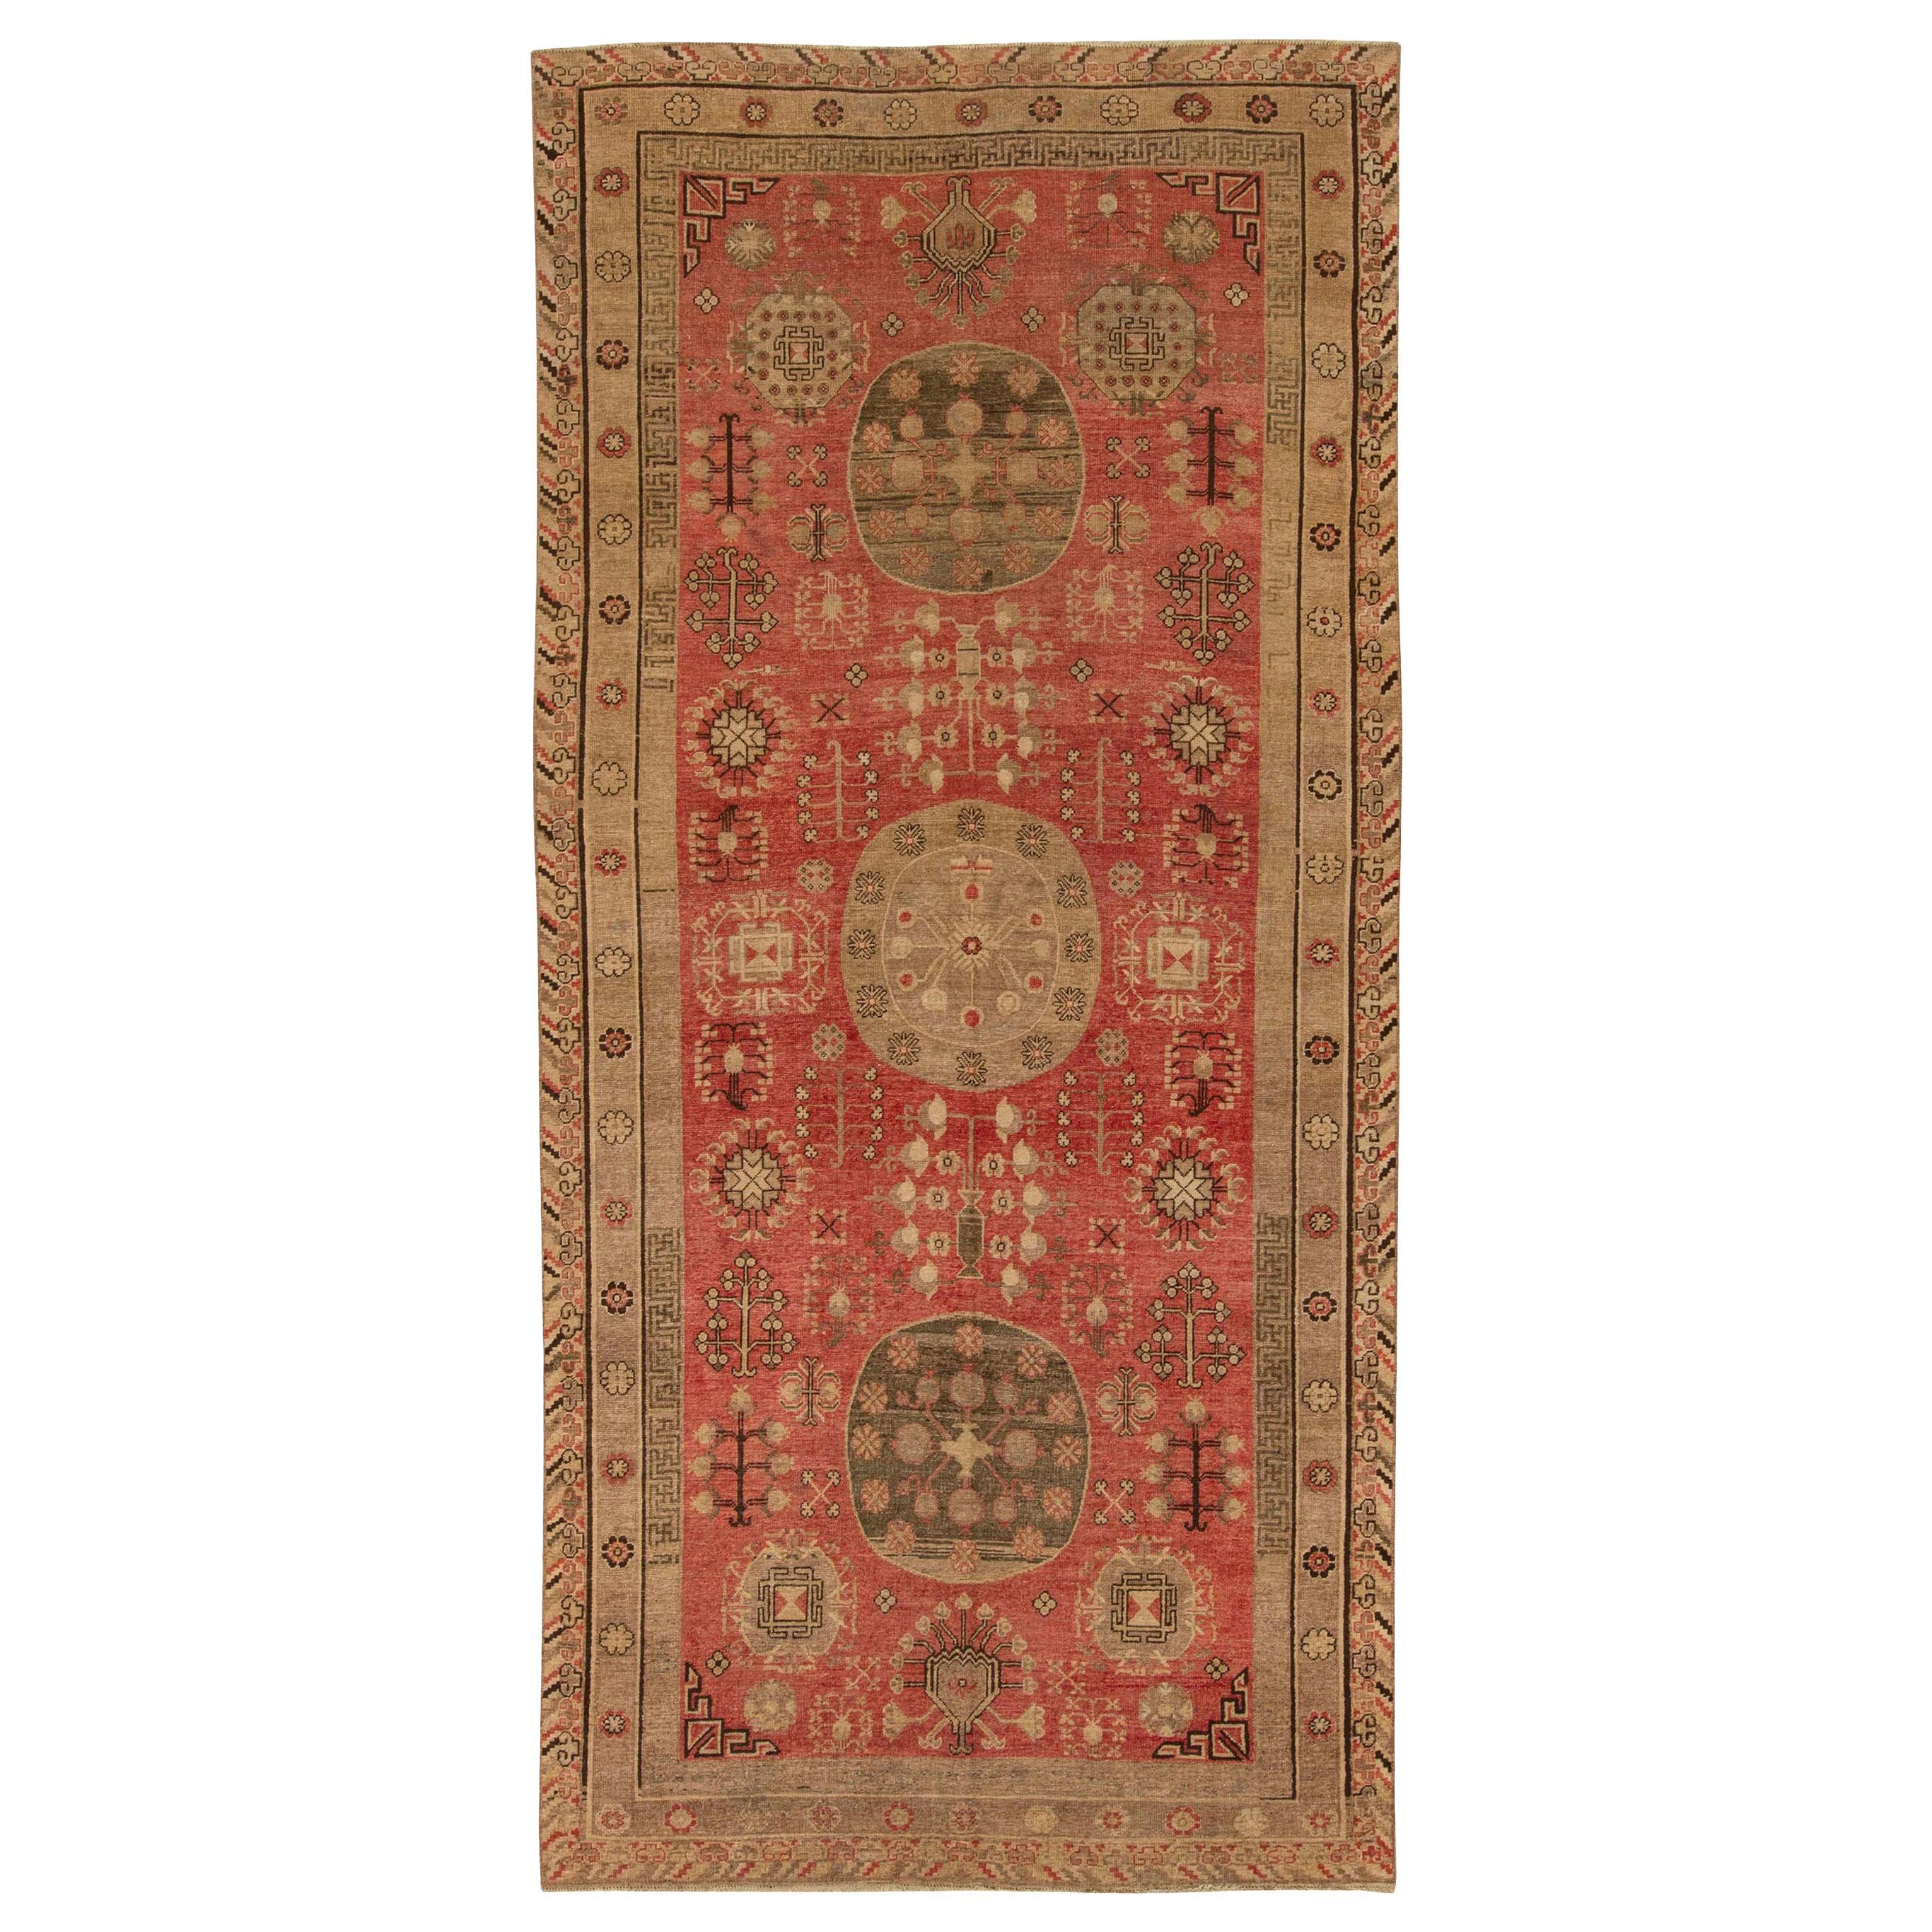 Midcentury Samarkand Red and Brown Handmade Wool Rug